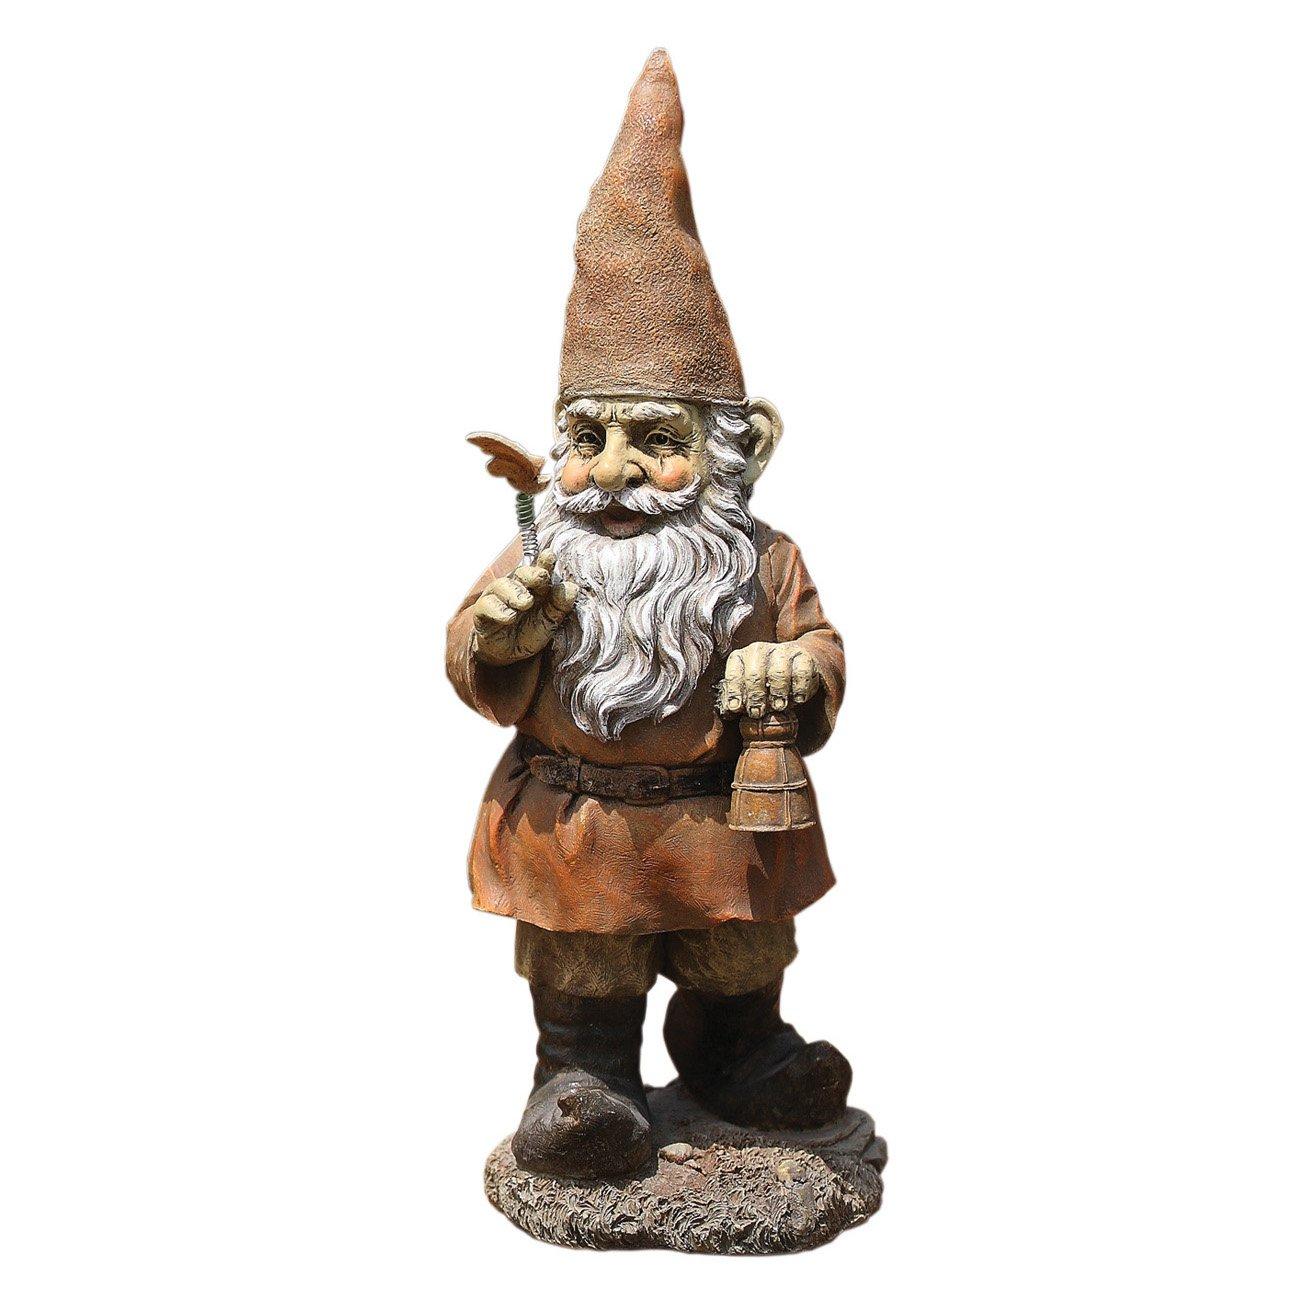 Gnome Standing with Bell 12 Inch Resin Decorative Indoor Outdoor Garden Statue Figurine